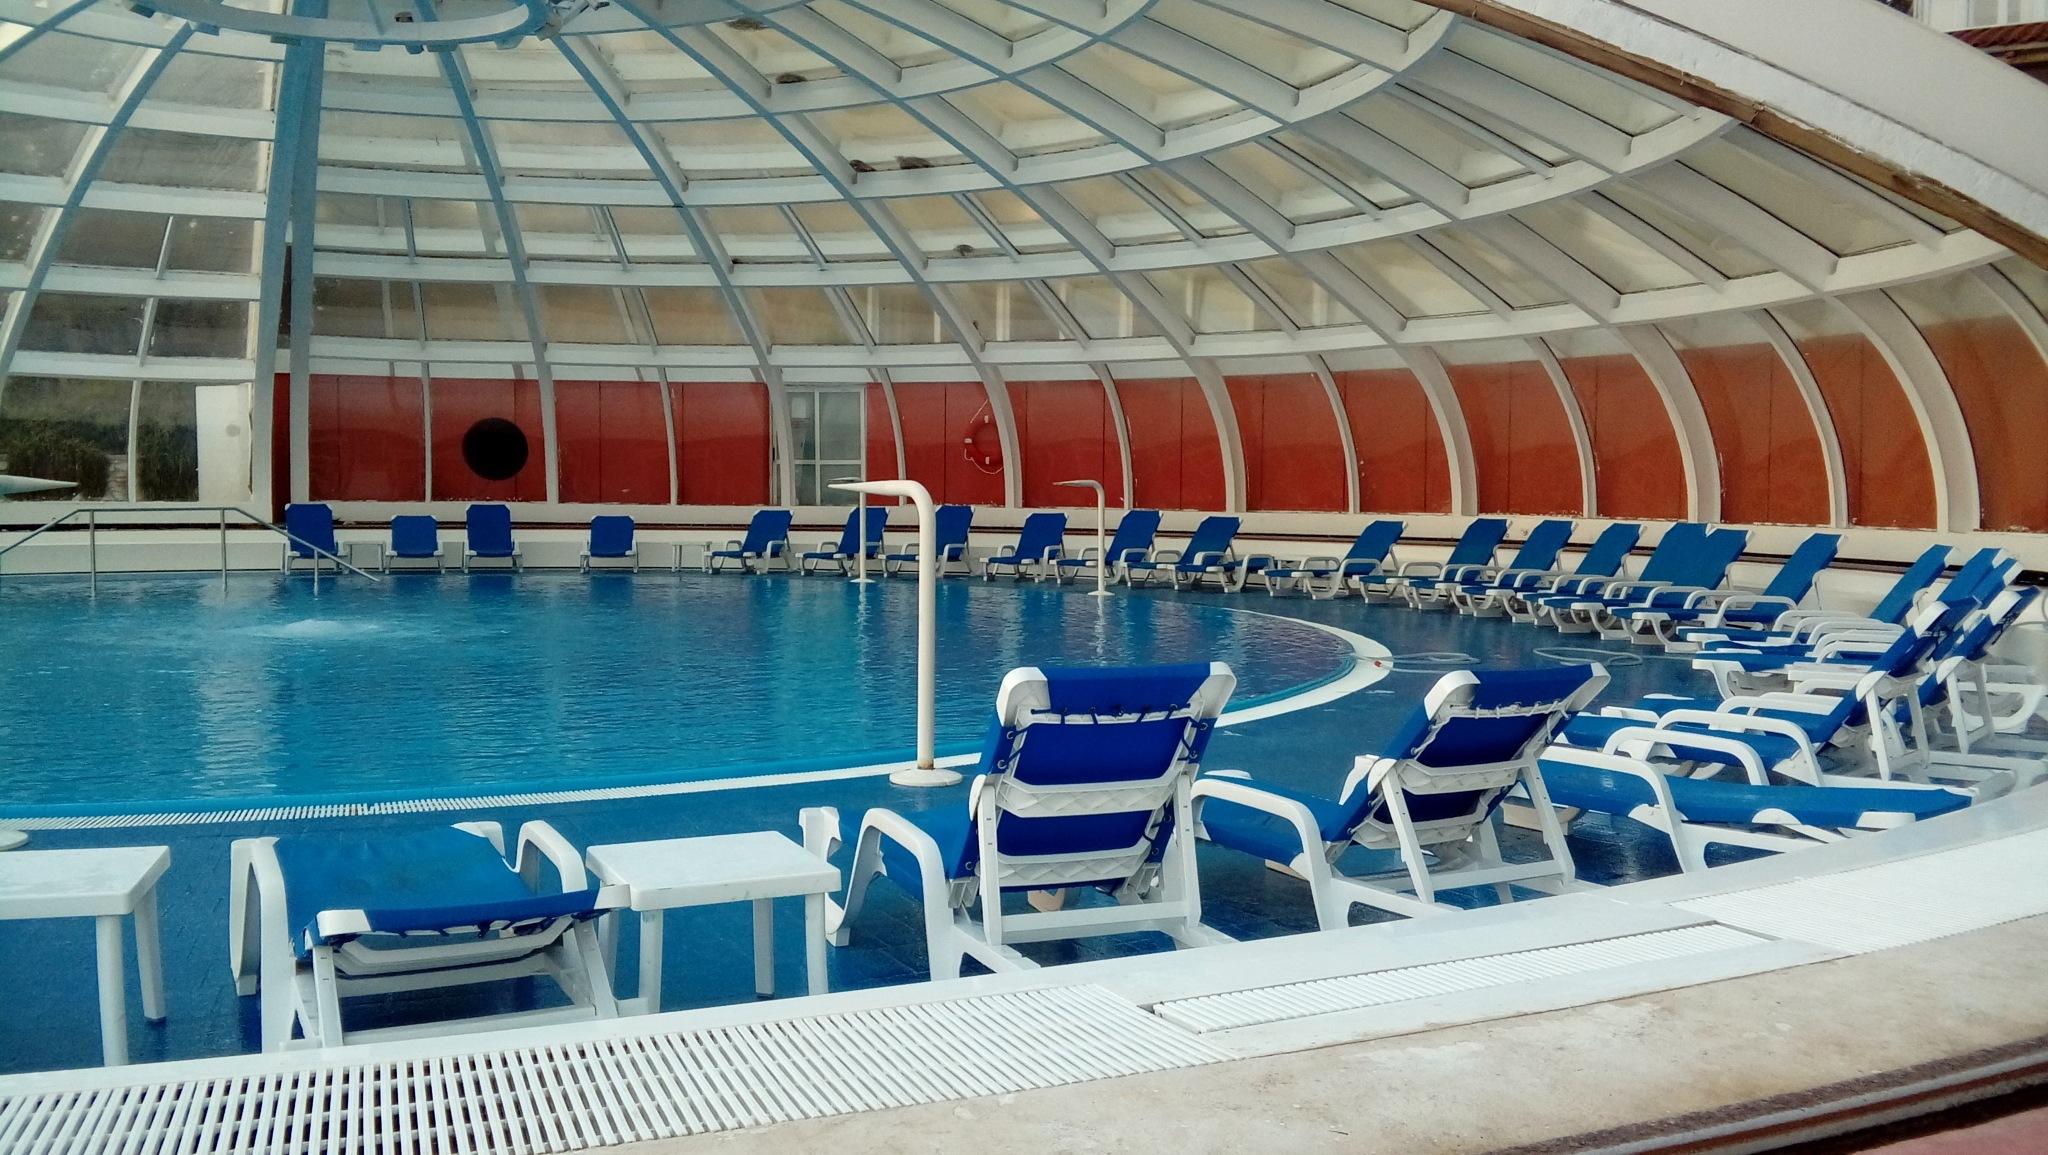 Swimming pool by Ana-Marija Veg